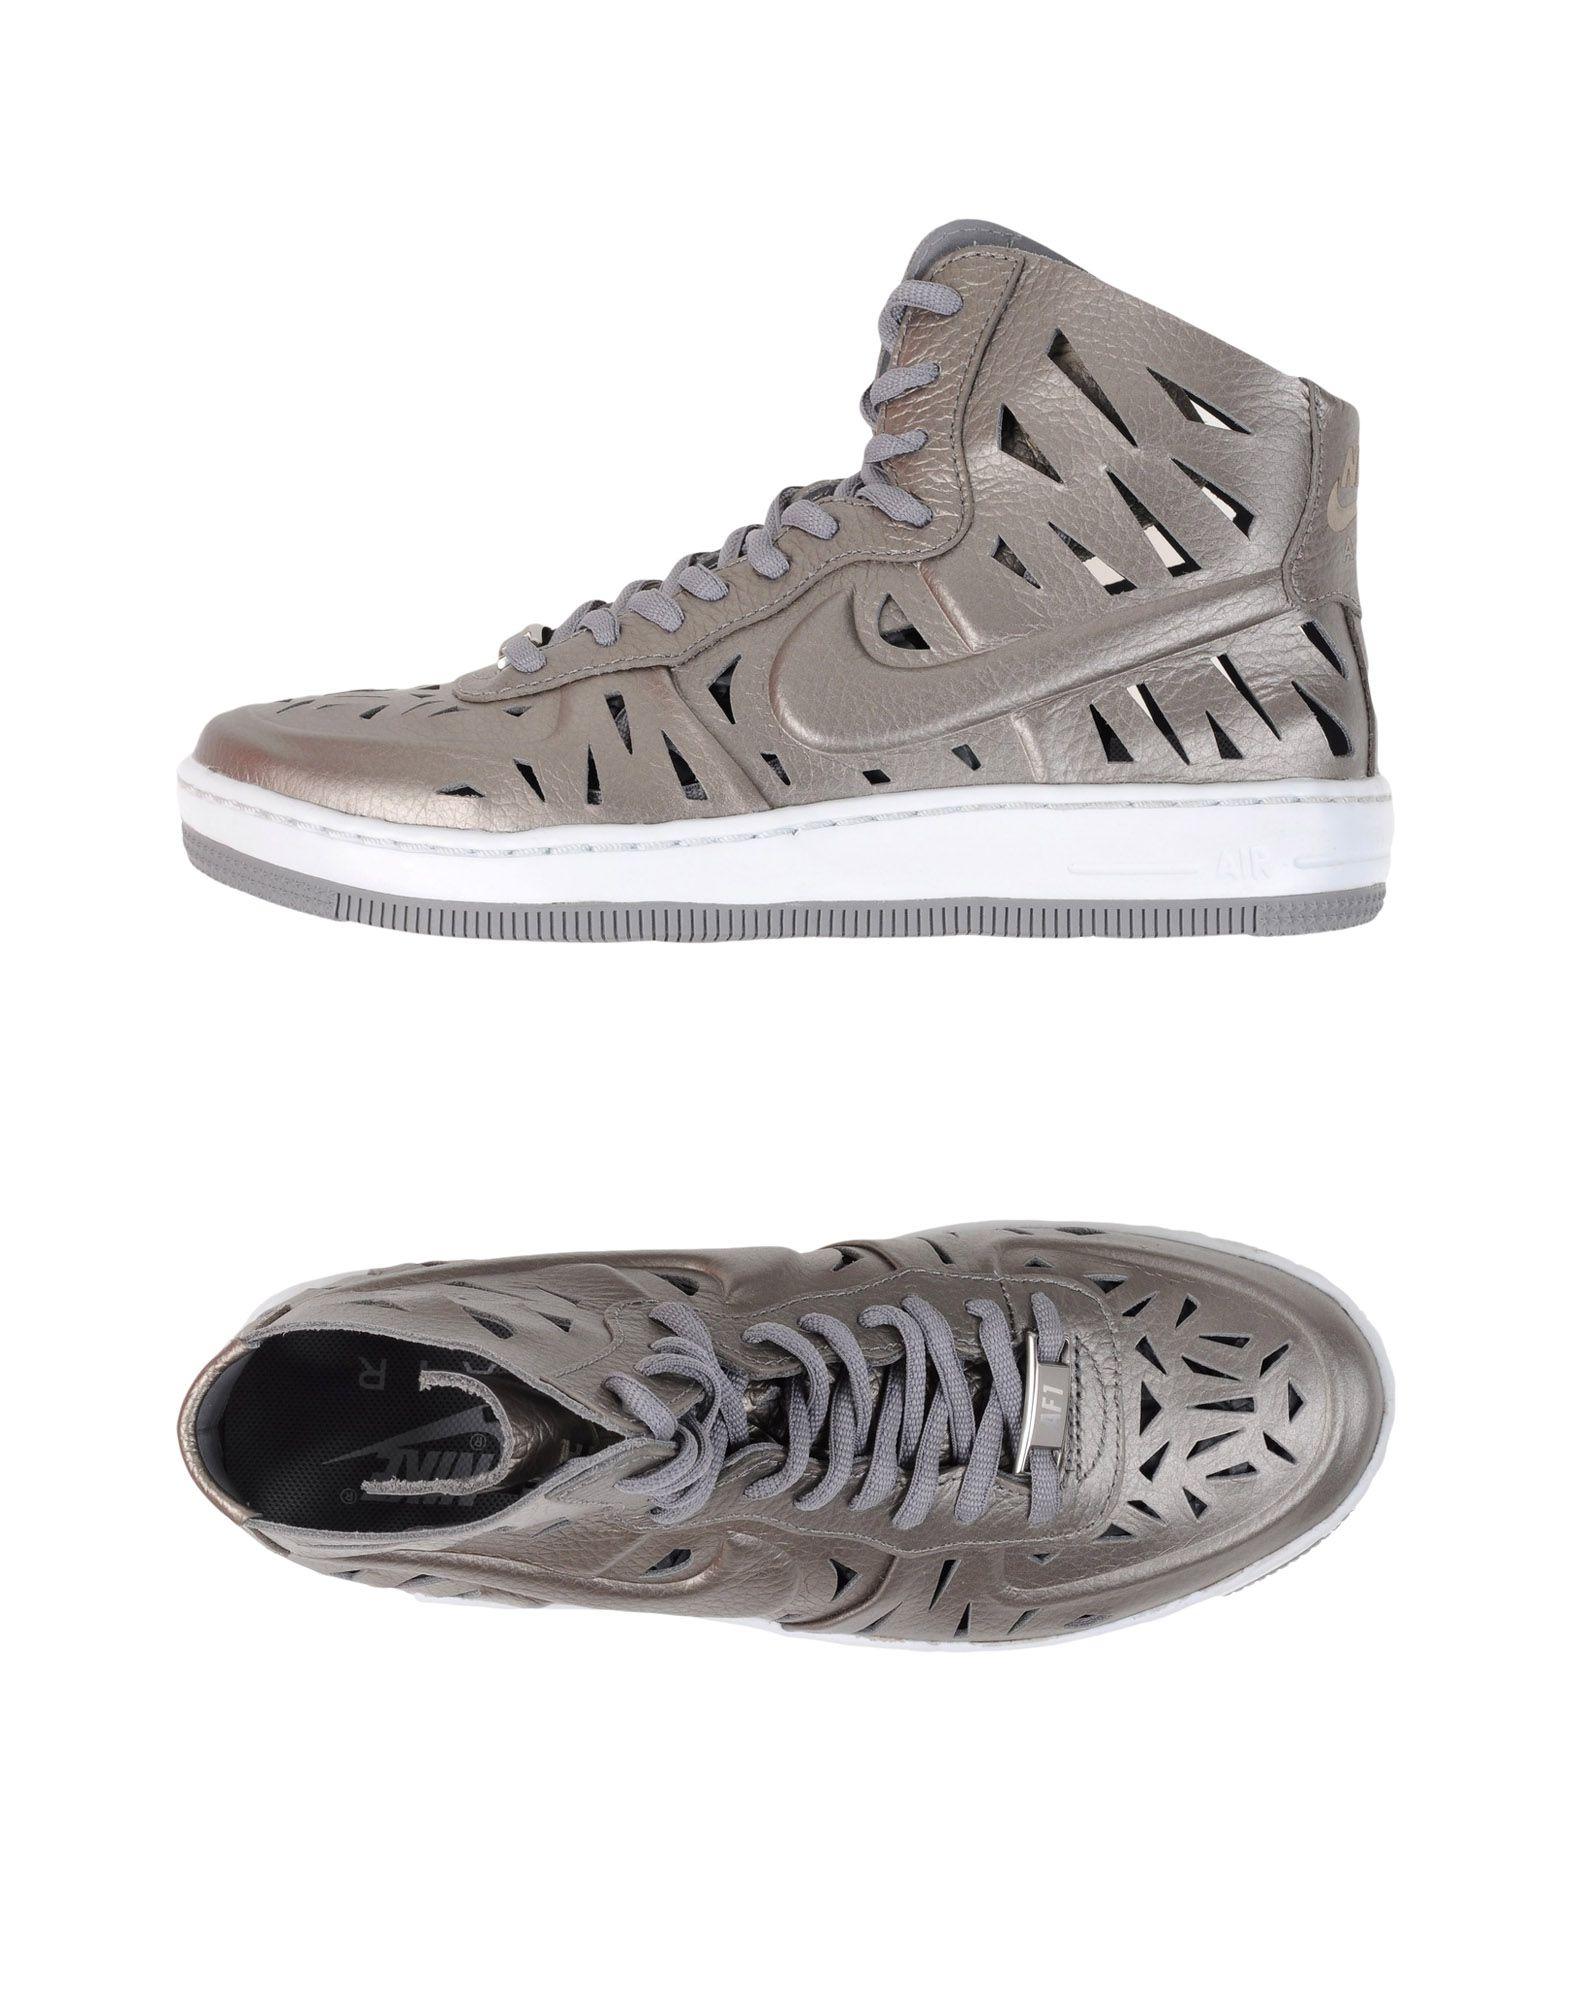 Nike Sneakers Damen   Damen 11116337TK Gute Qualität beliebte Schuhe 32c928